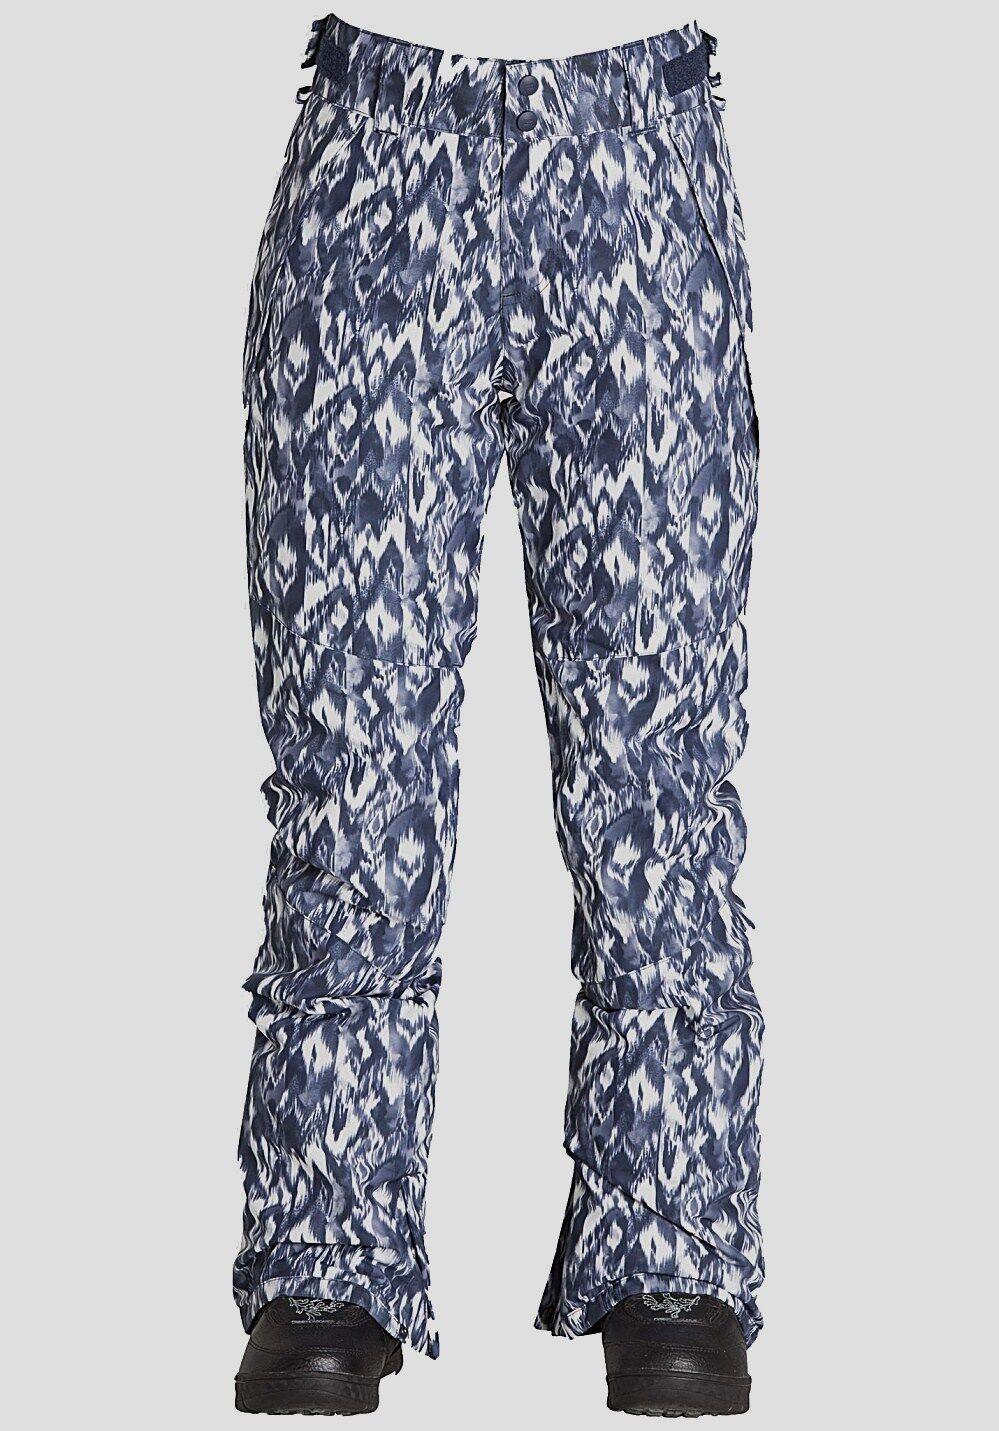 BILLABONG Women's MALLA Snow Pants -  IKB - Medium - NWT  new exclusive high-end